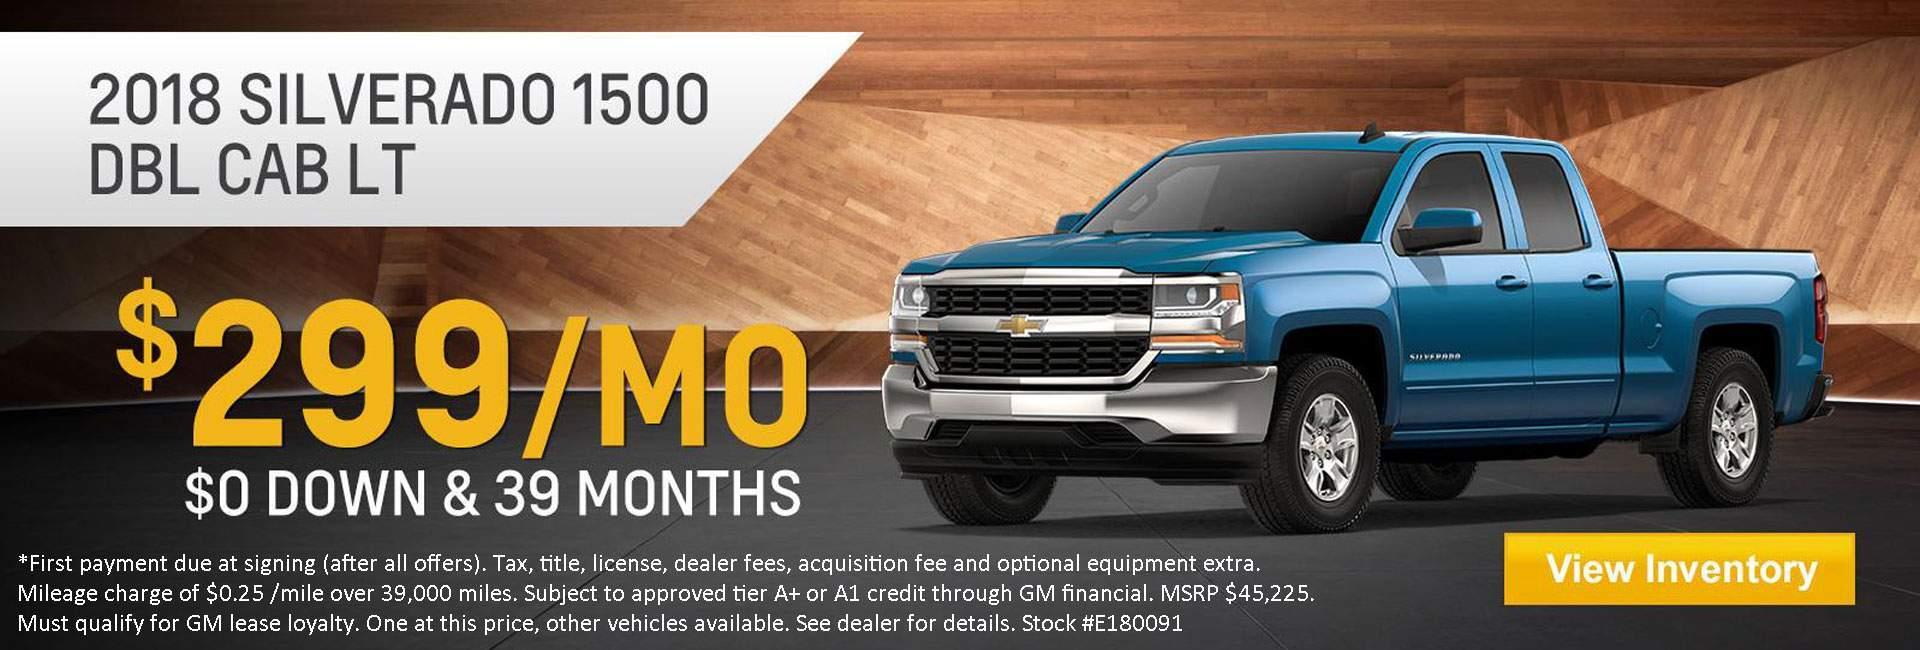 Jeff Schmitt Chevrolet Miamisburg >> Chevrolet, Mazda, Nissan, Dayton OH | Cadillac Mitsubishi | Jeff Schmitt Auto Group New & Used ...